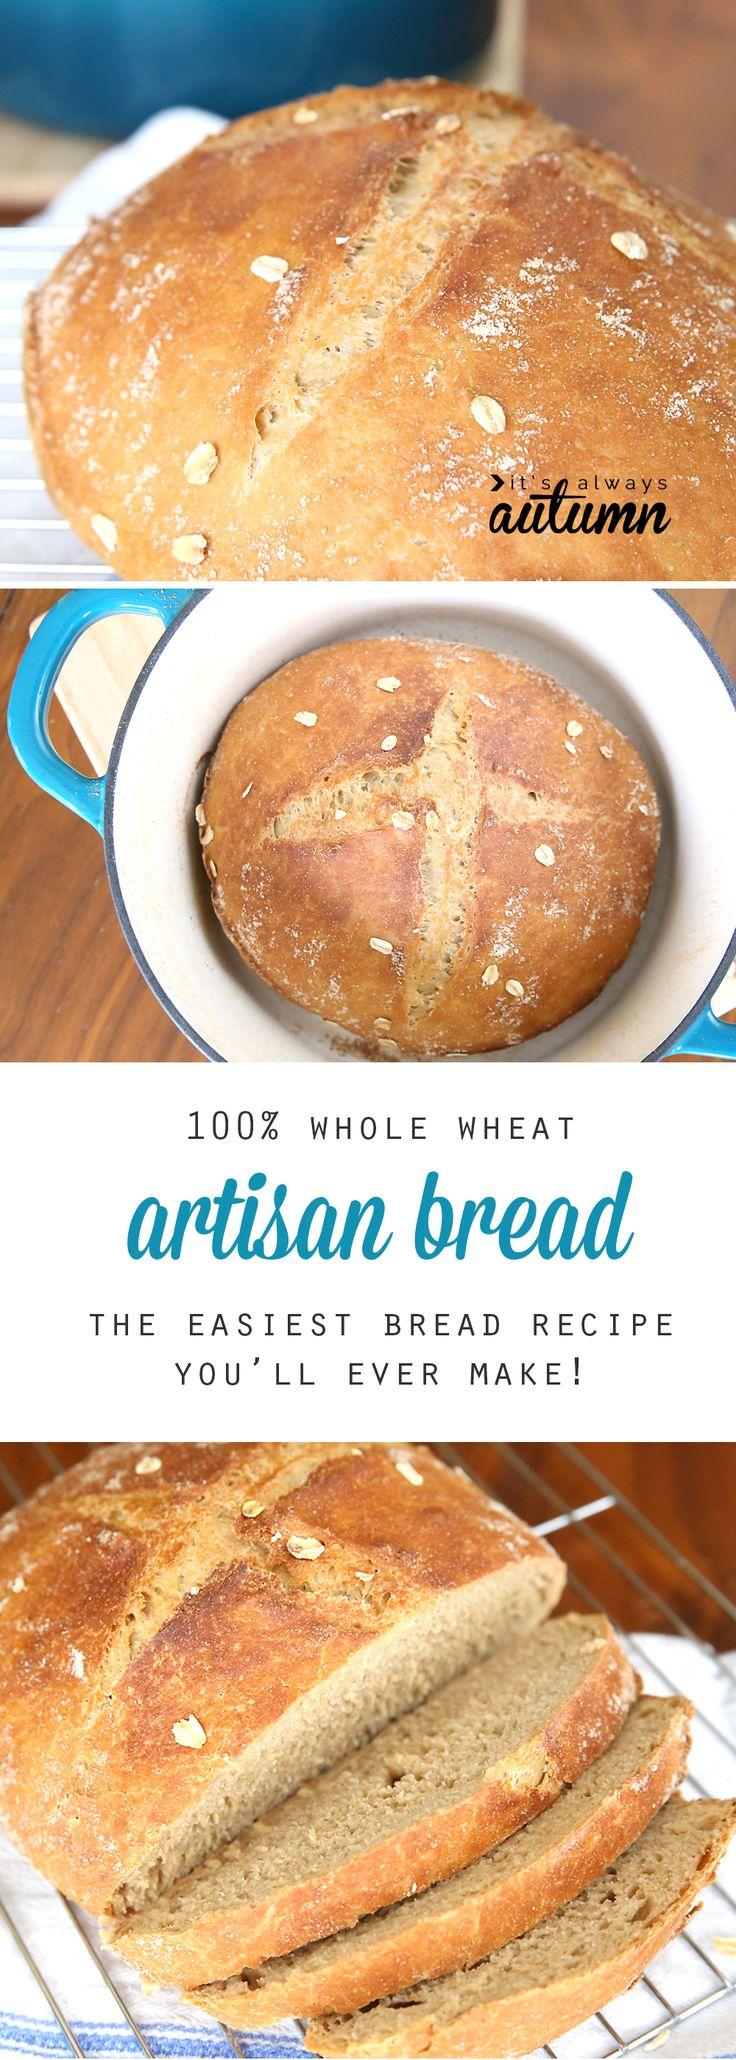 Best 25+ Artisan bread ideas on Pinterest | Dutch oven ...